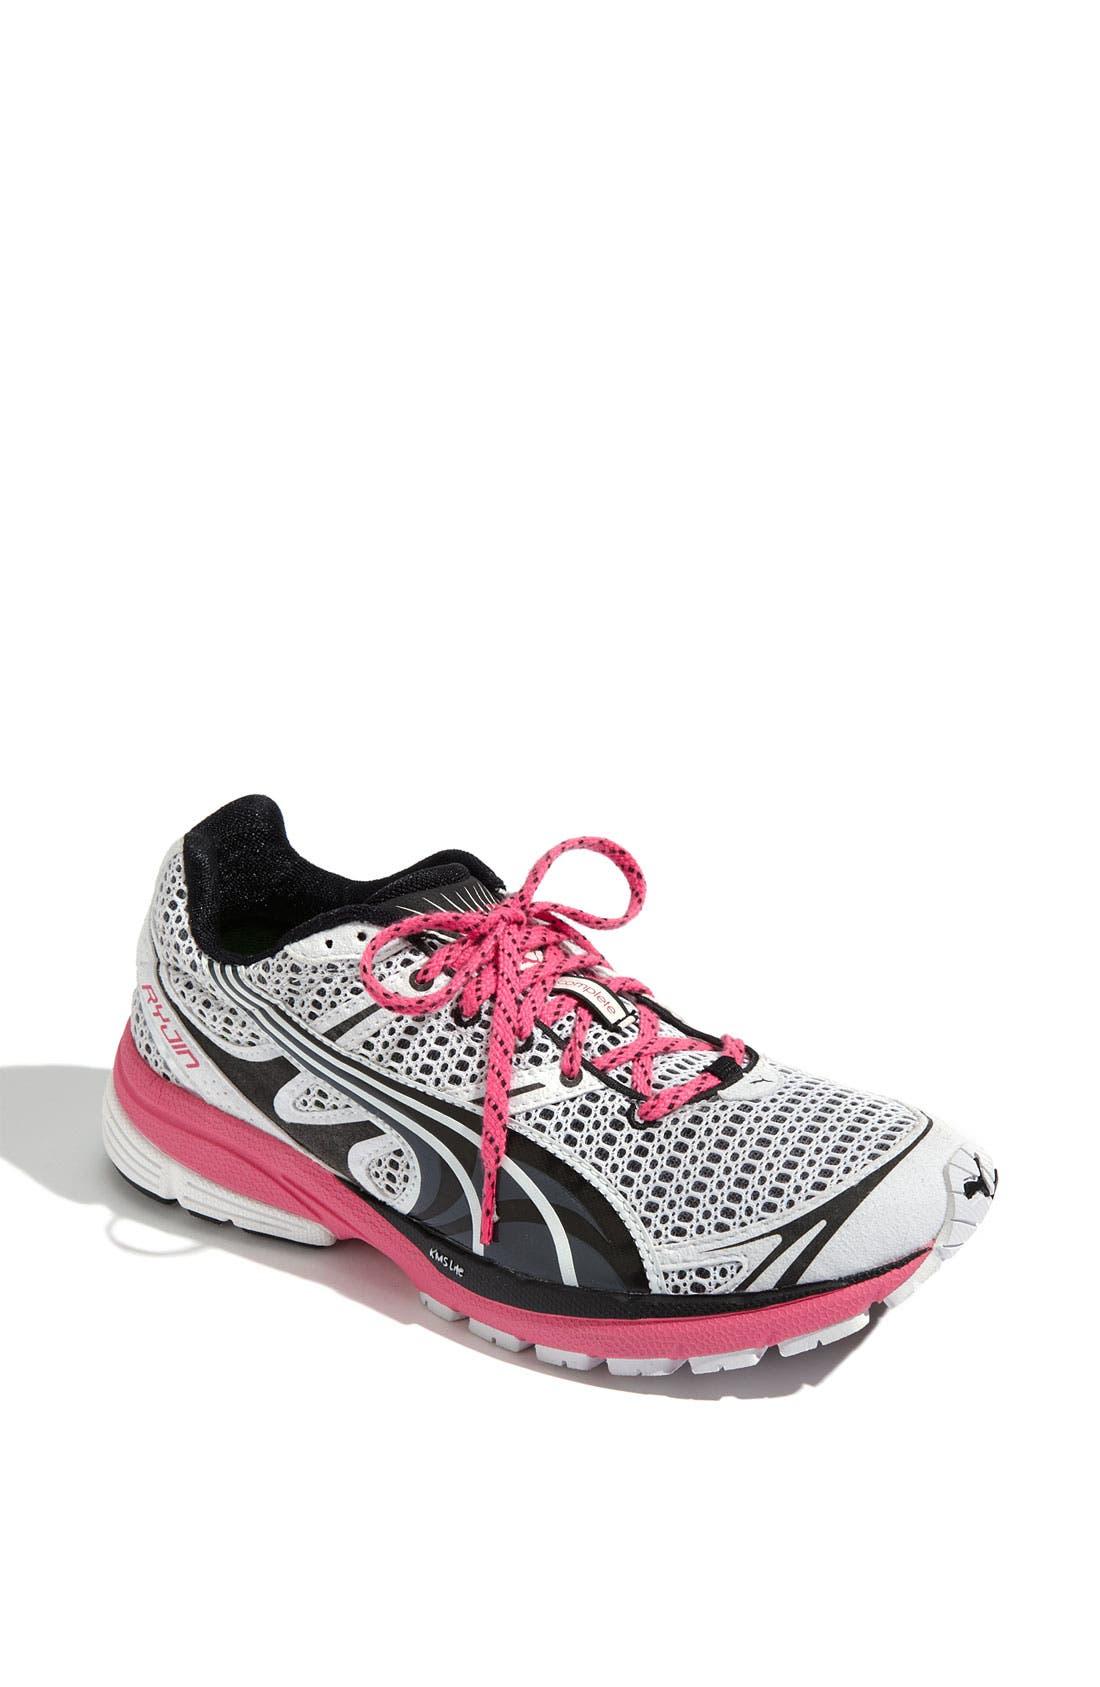 Alternate Image 1 Selected - PUMA 'Complete SLX Ryjin' Running Shoe (Women)